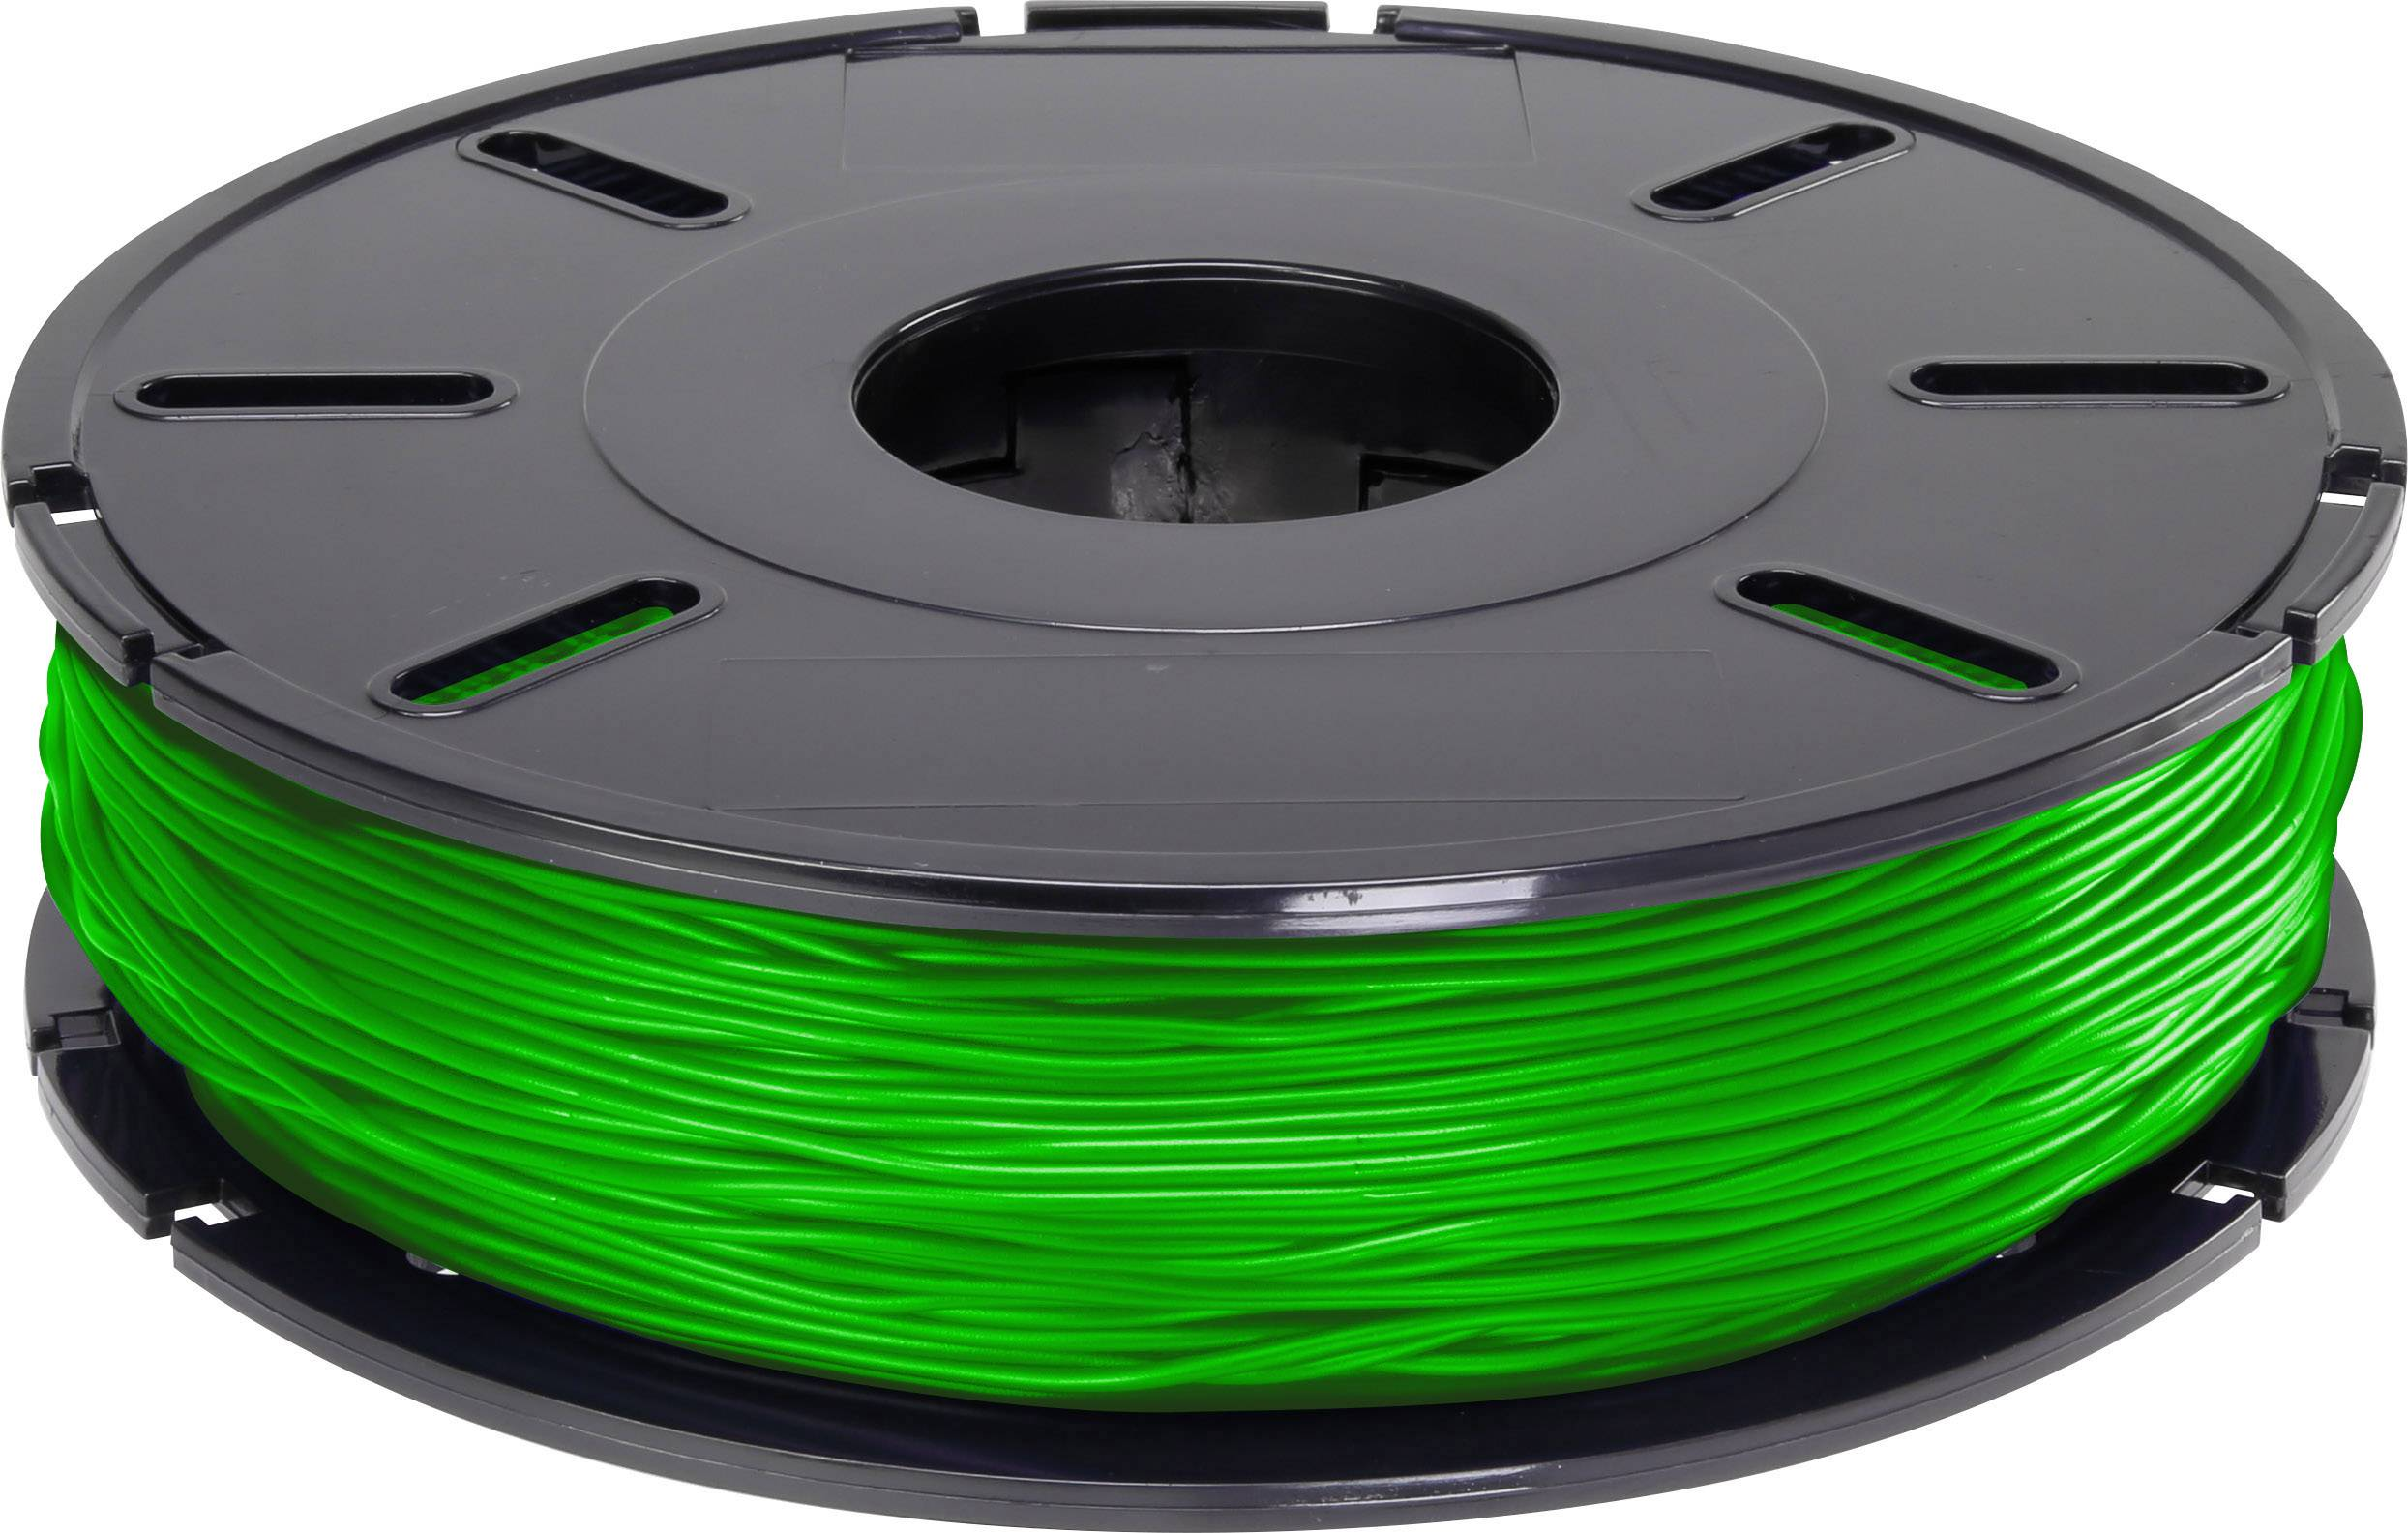 Vlákno pro 3D tiskárny Renkforce 01.04.13.5209, elastické , 2.85 mm, 500 g, zelená